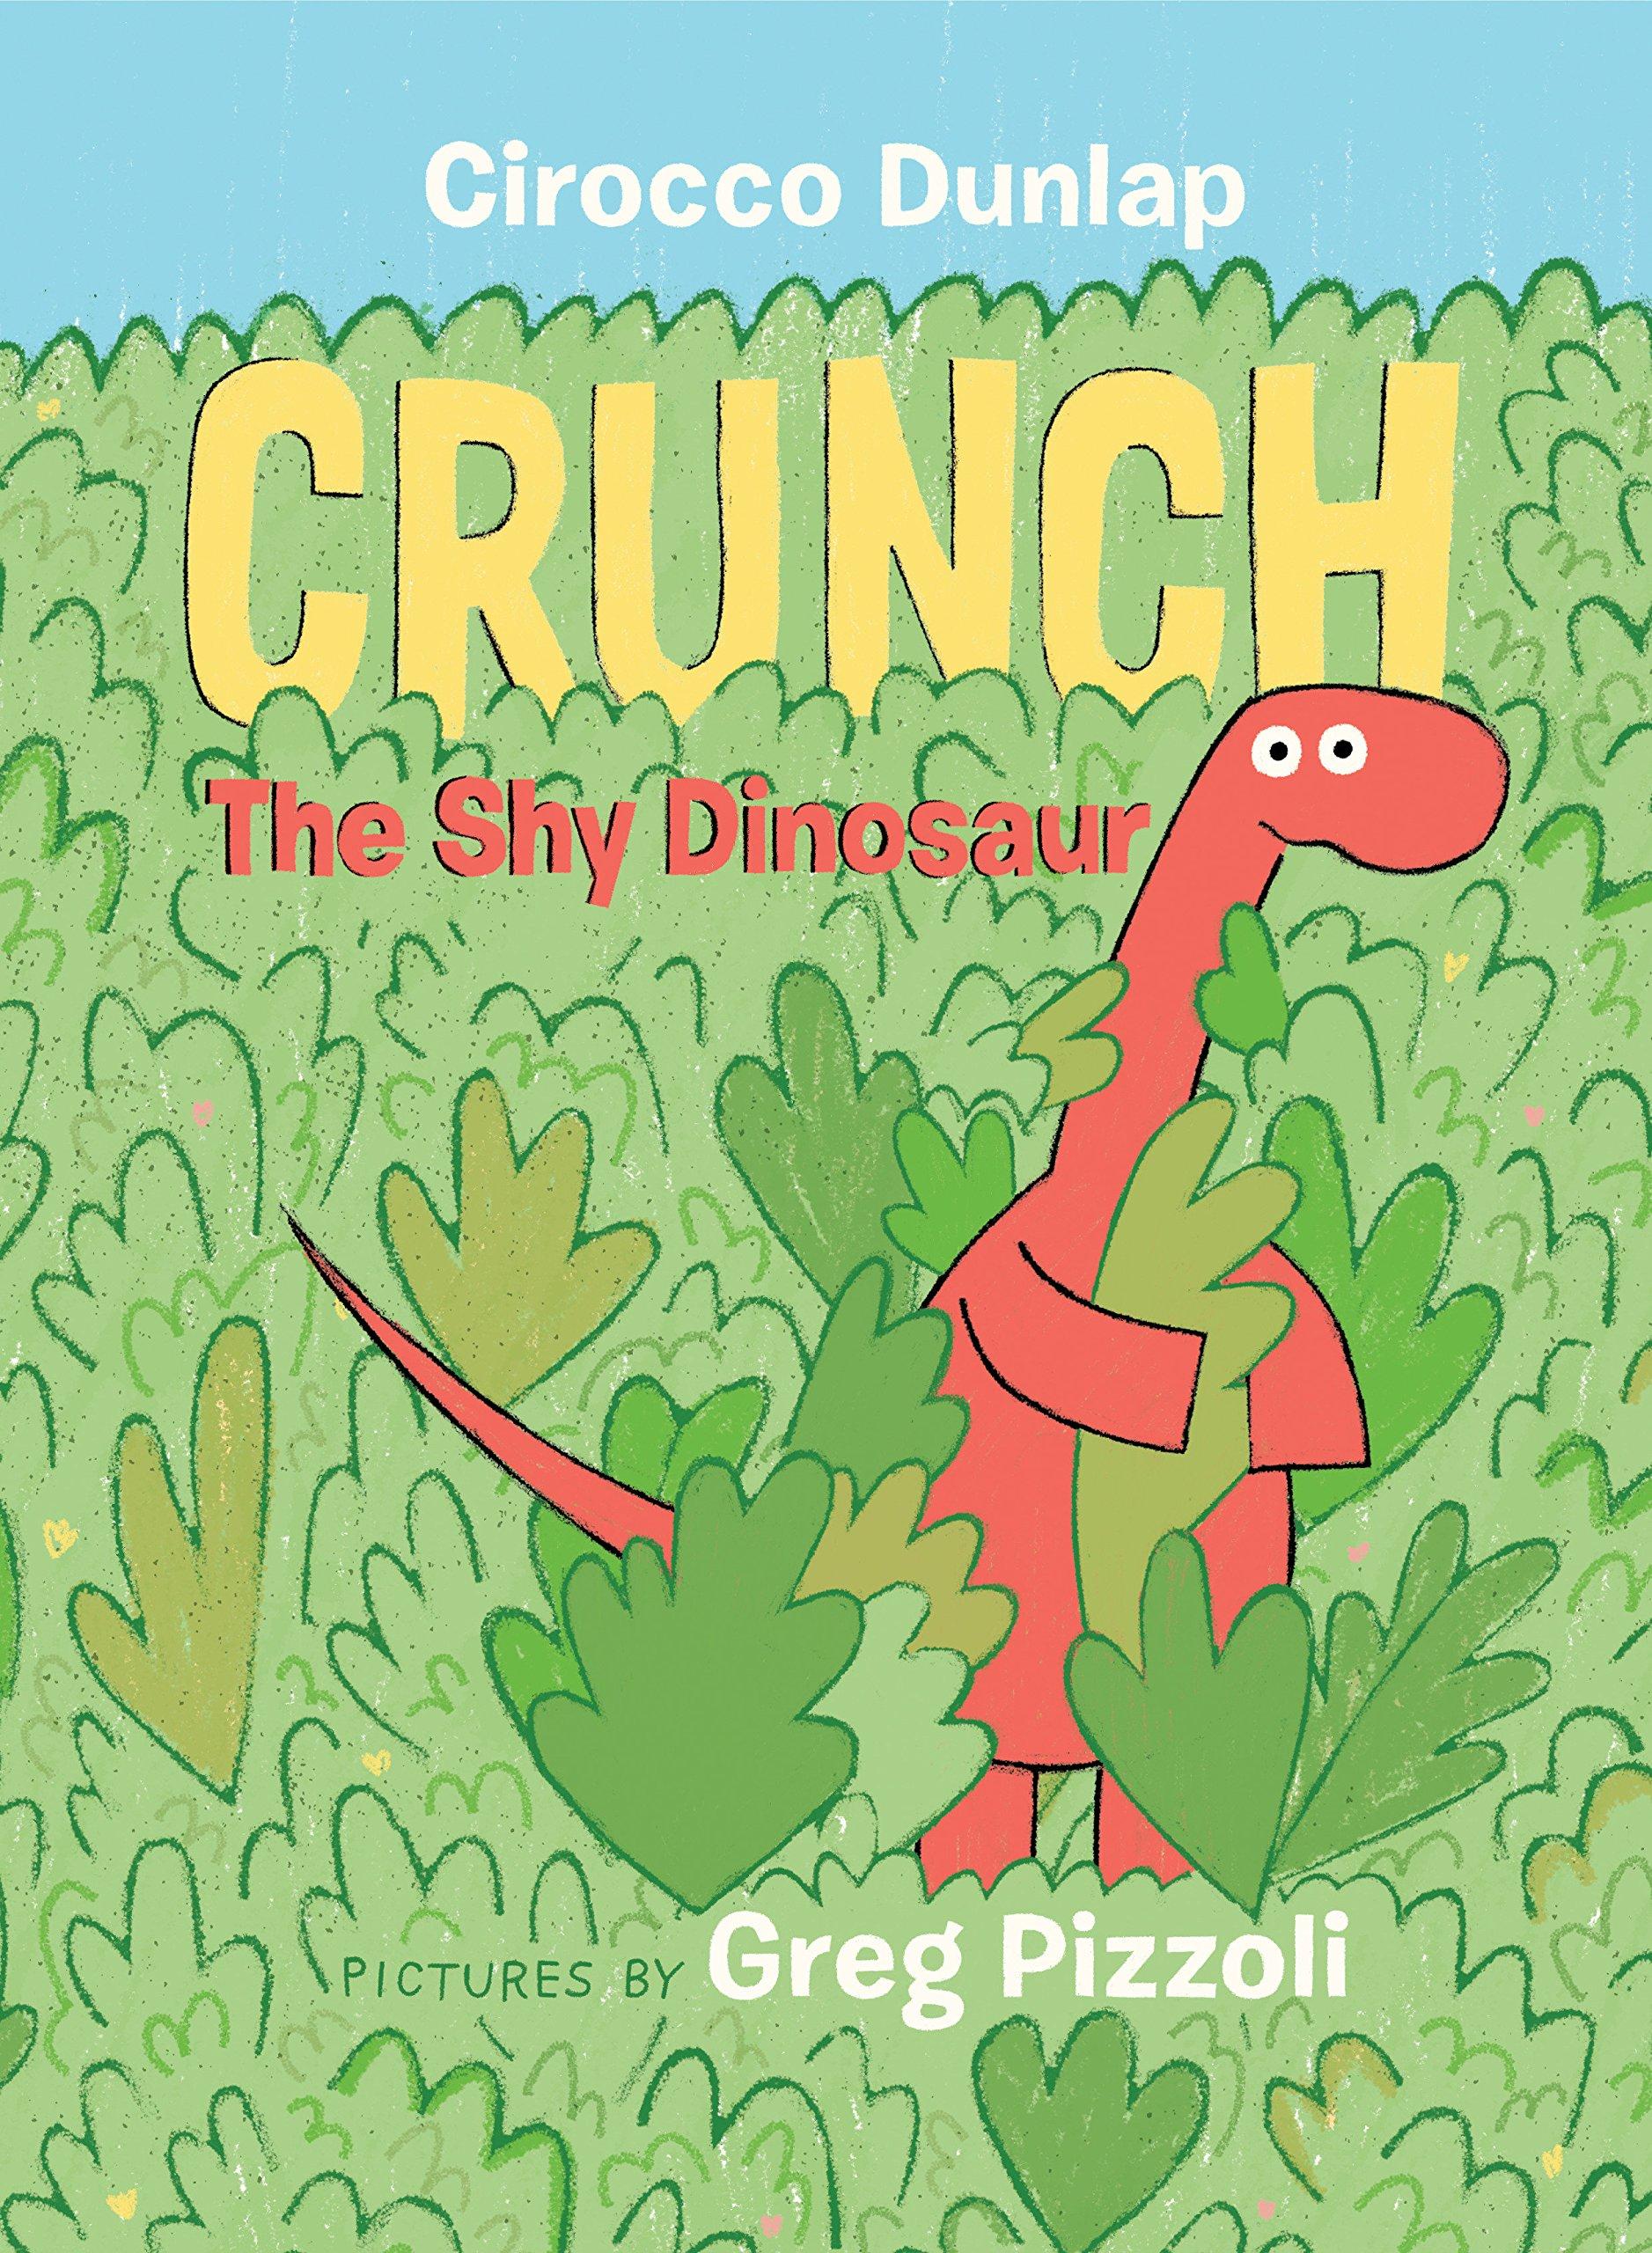 Crunch by Dunlap